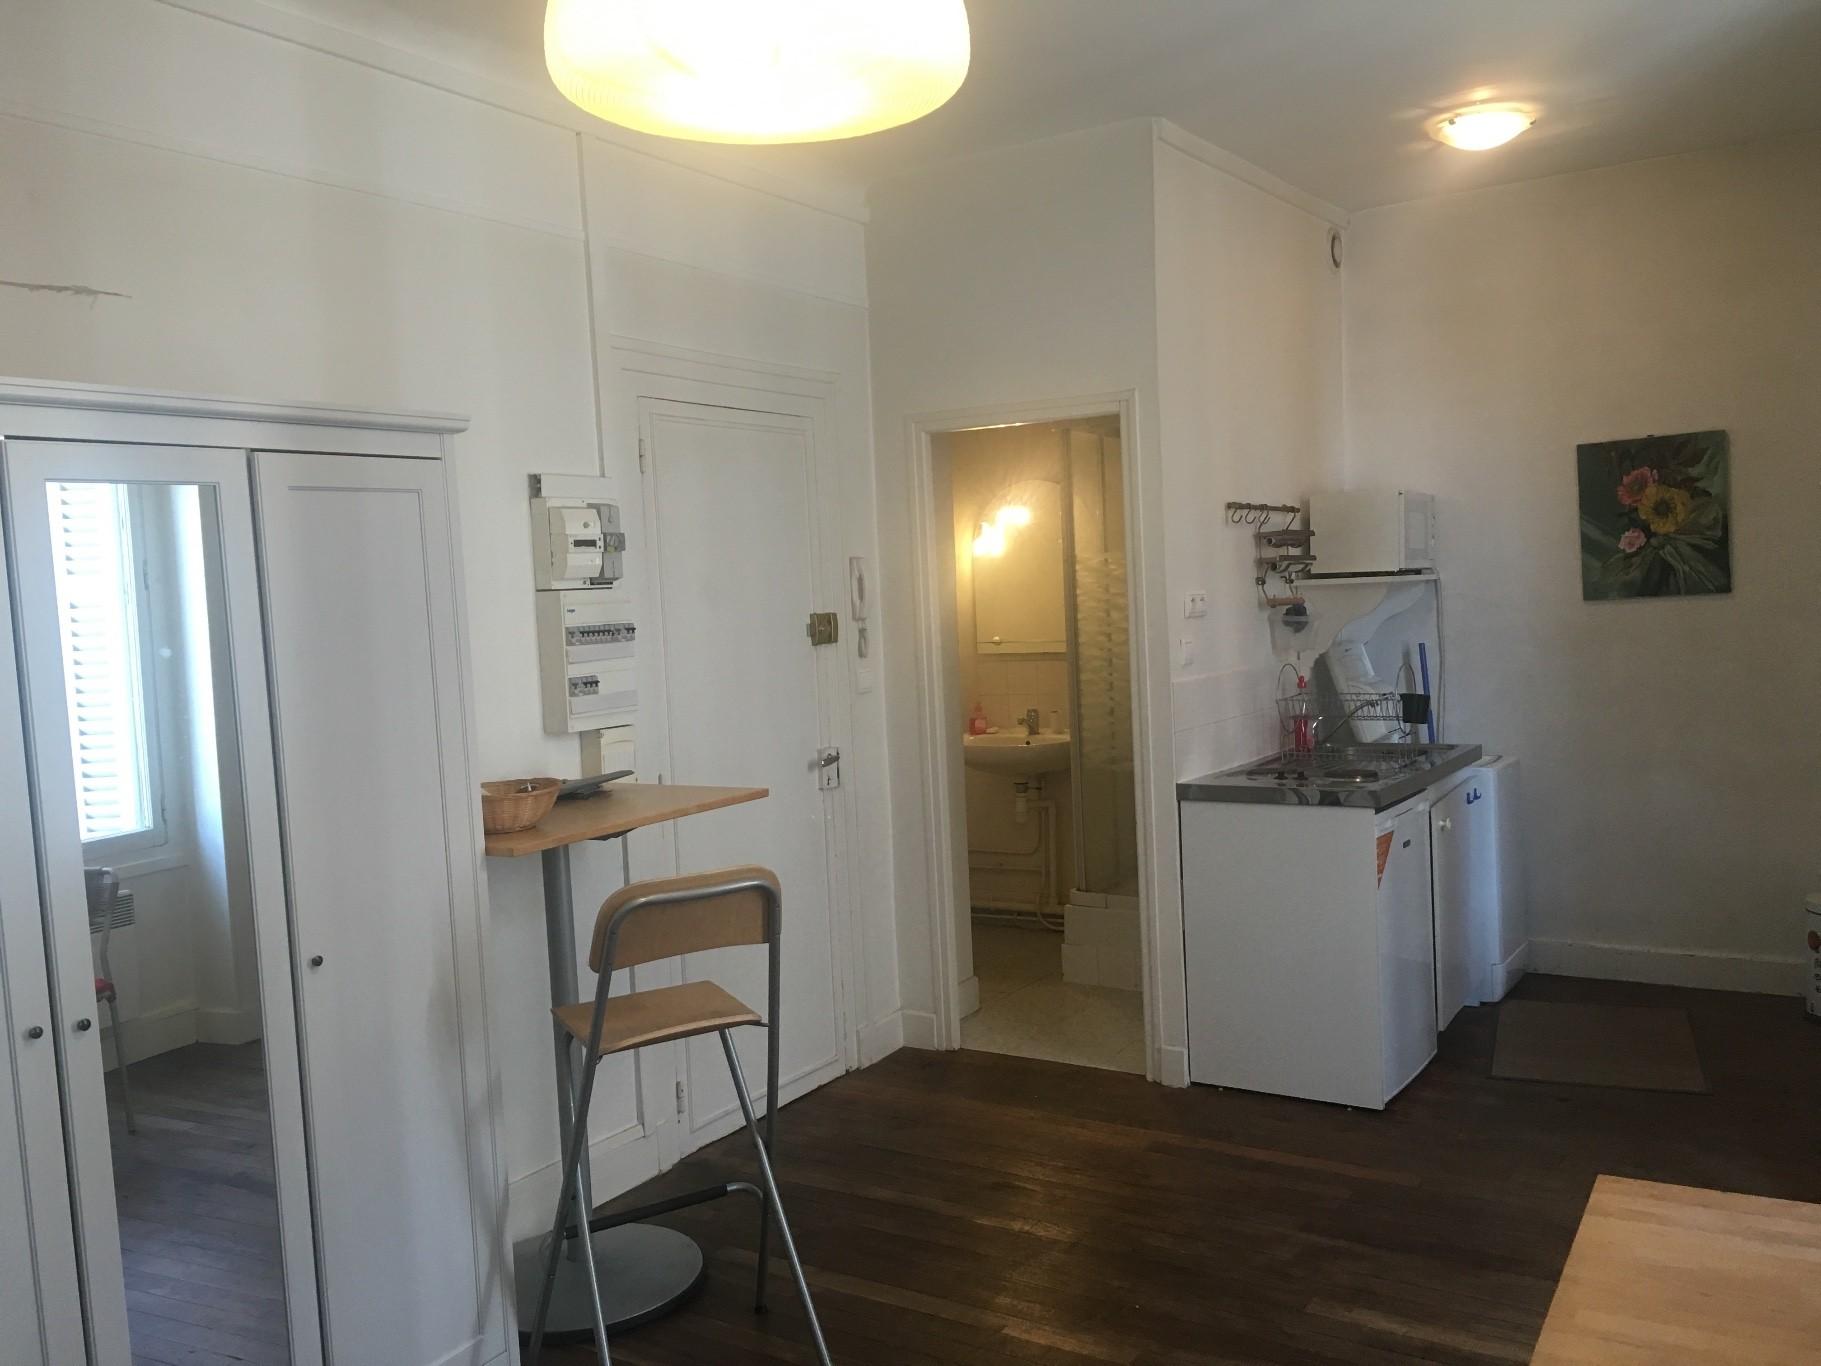 dijon rue d 39 auxonne vente studio 1 pi ce 23m2 55 000 r f 16 235 132056 cm immobilier. Black Bedroom Furniture Sets. Home Design Ideas